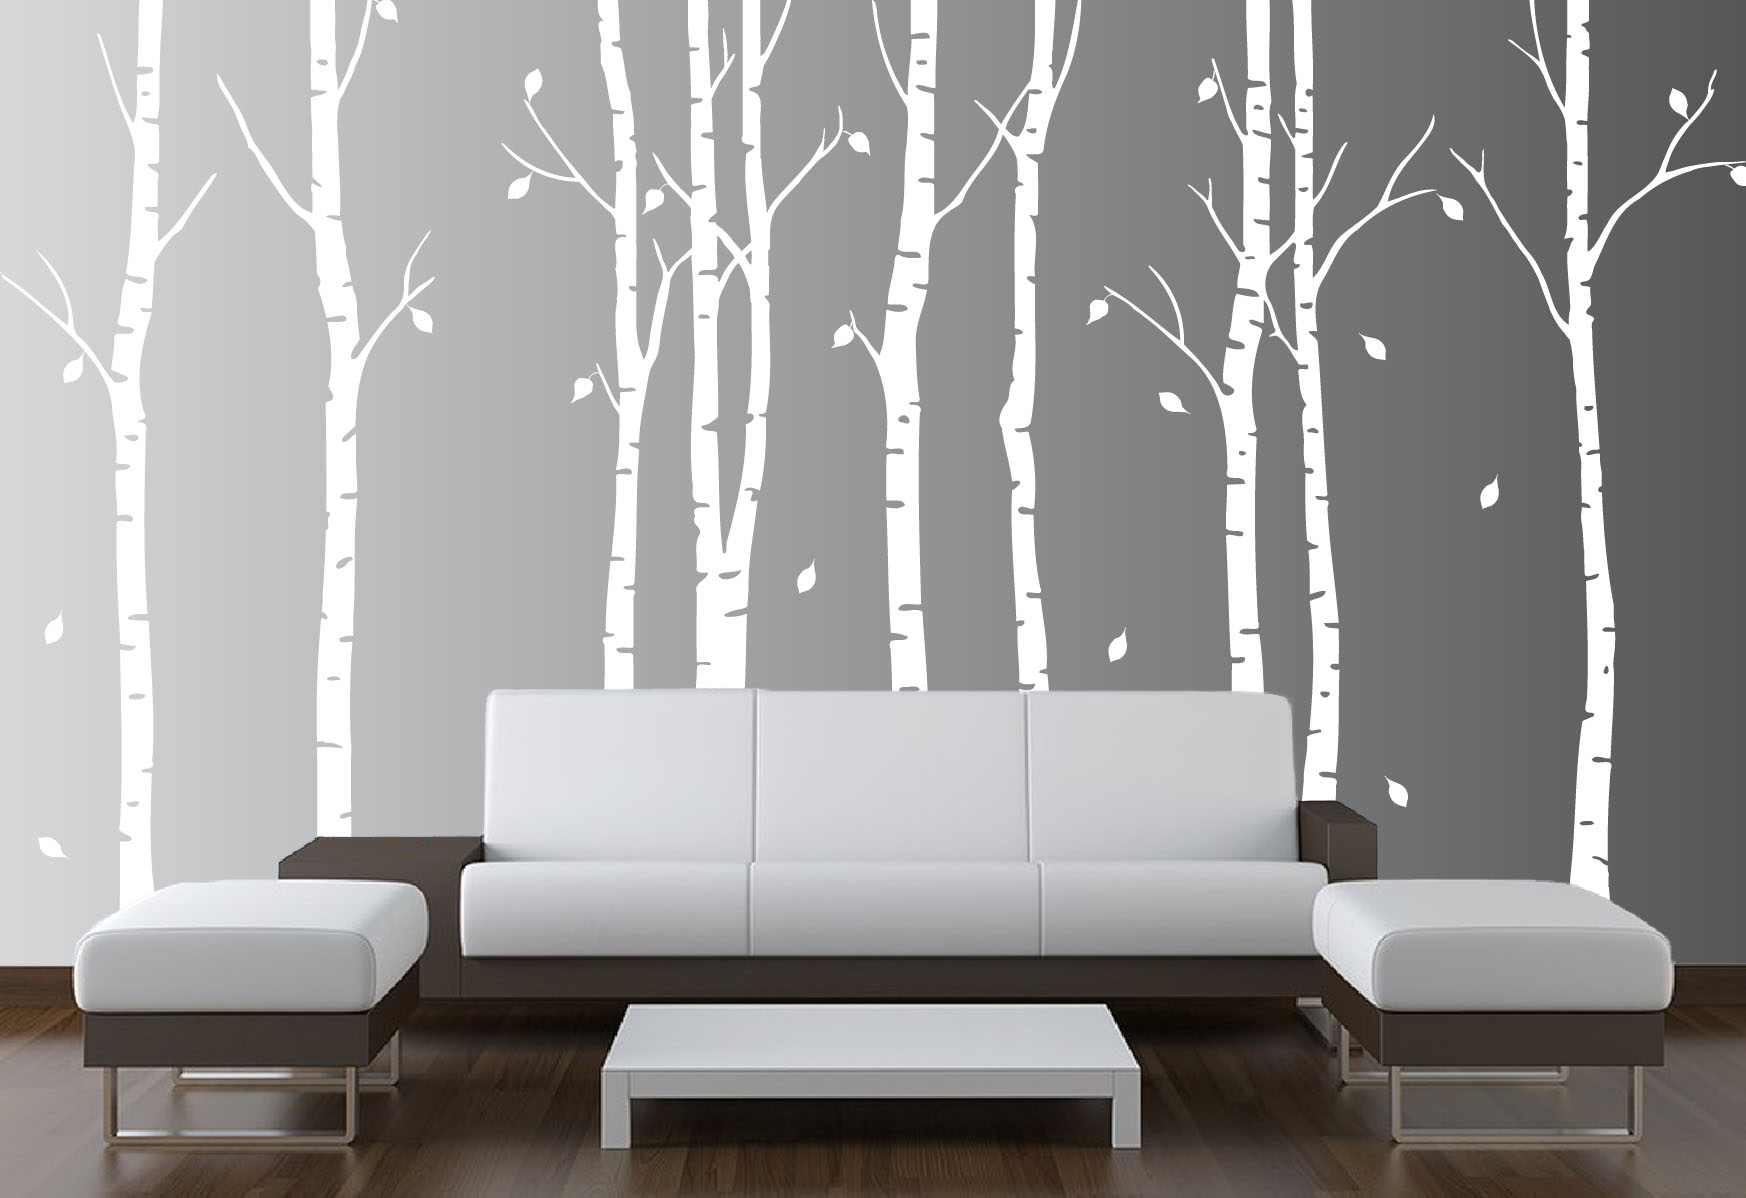 birch-tree-wall-decal-1263-forest.jpg